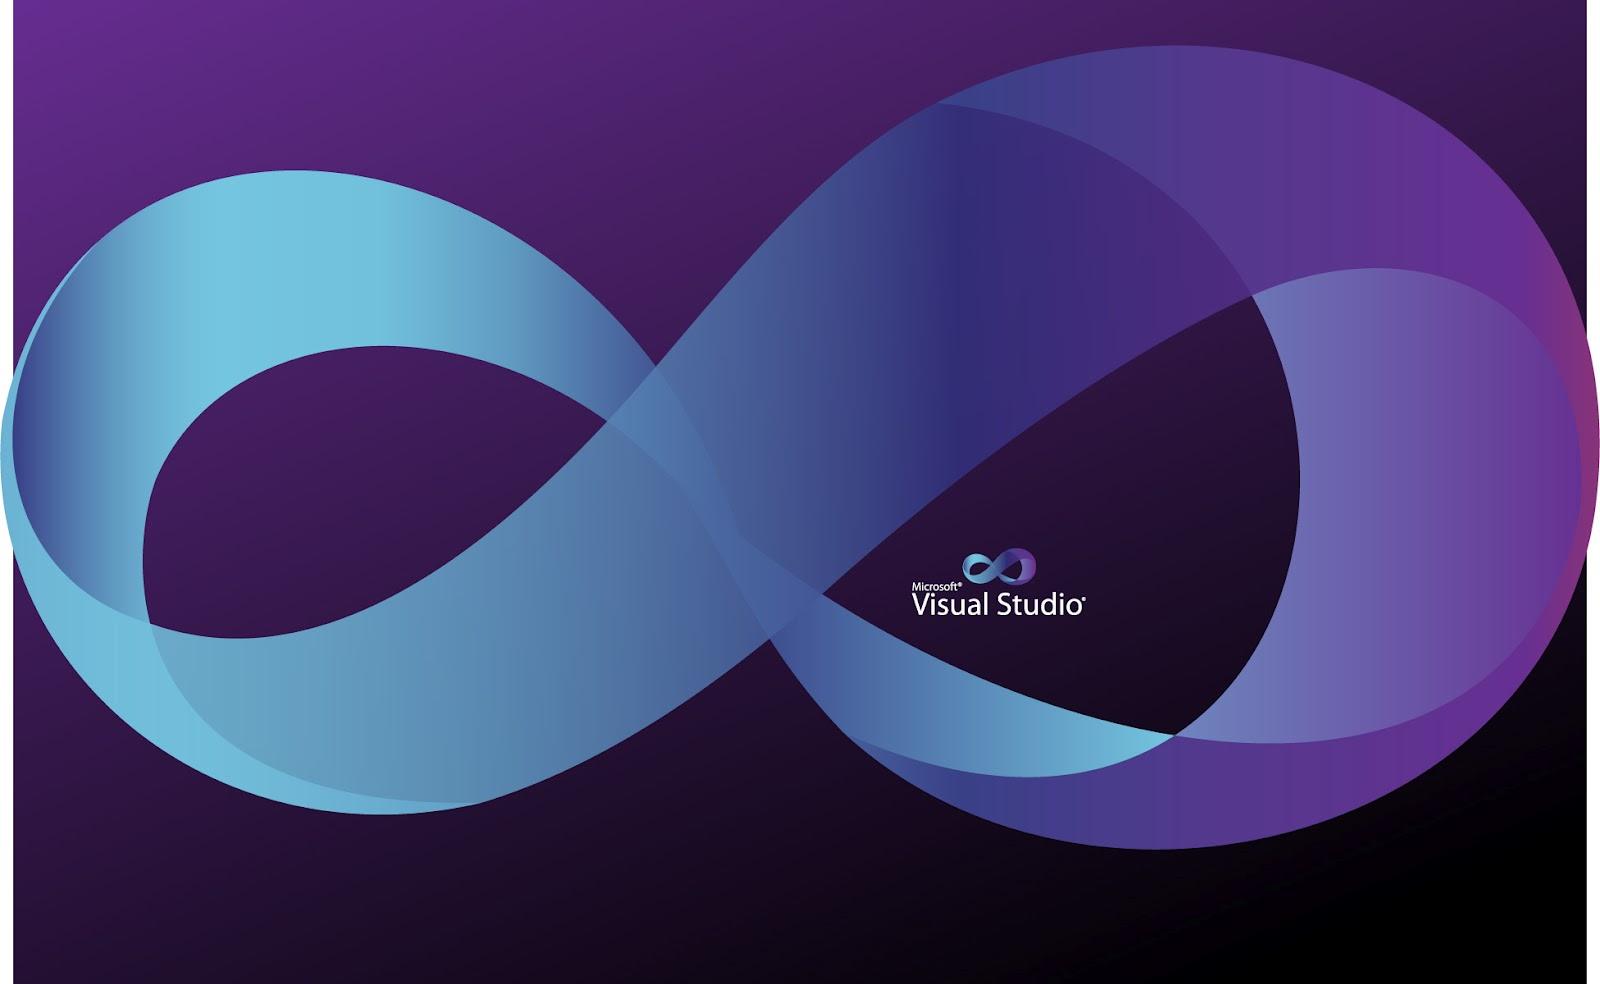 10 HD Microsoft Visual Studio Wallpaper Tam Super 1600x984